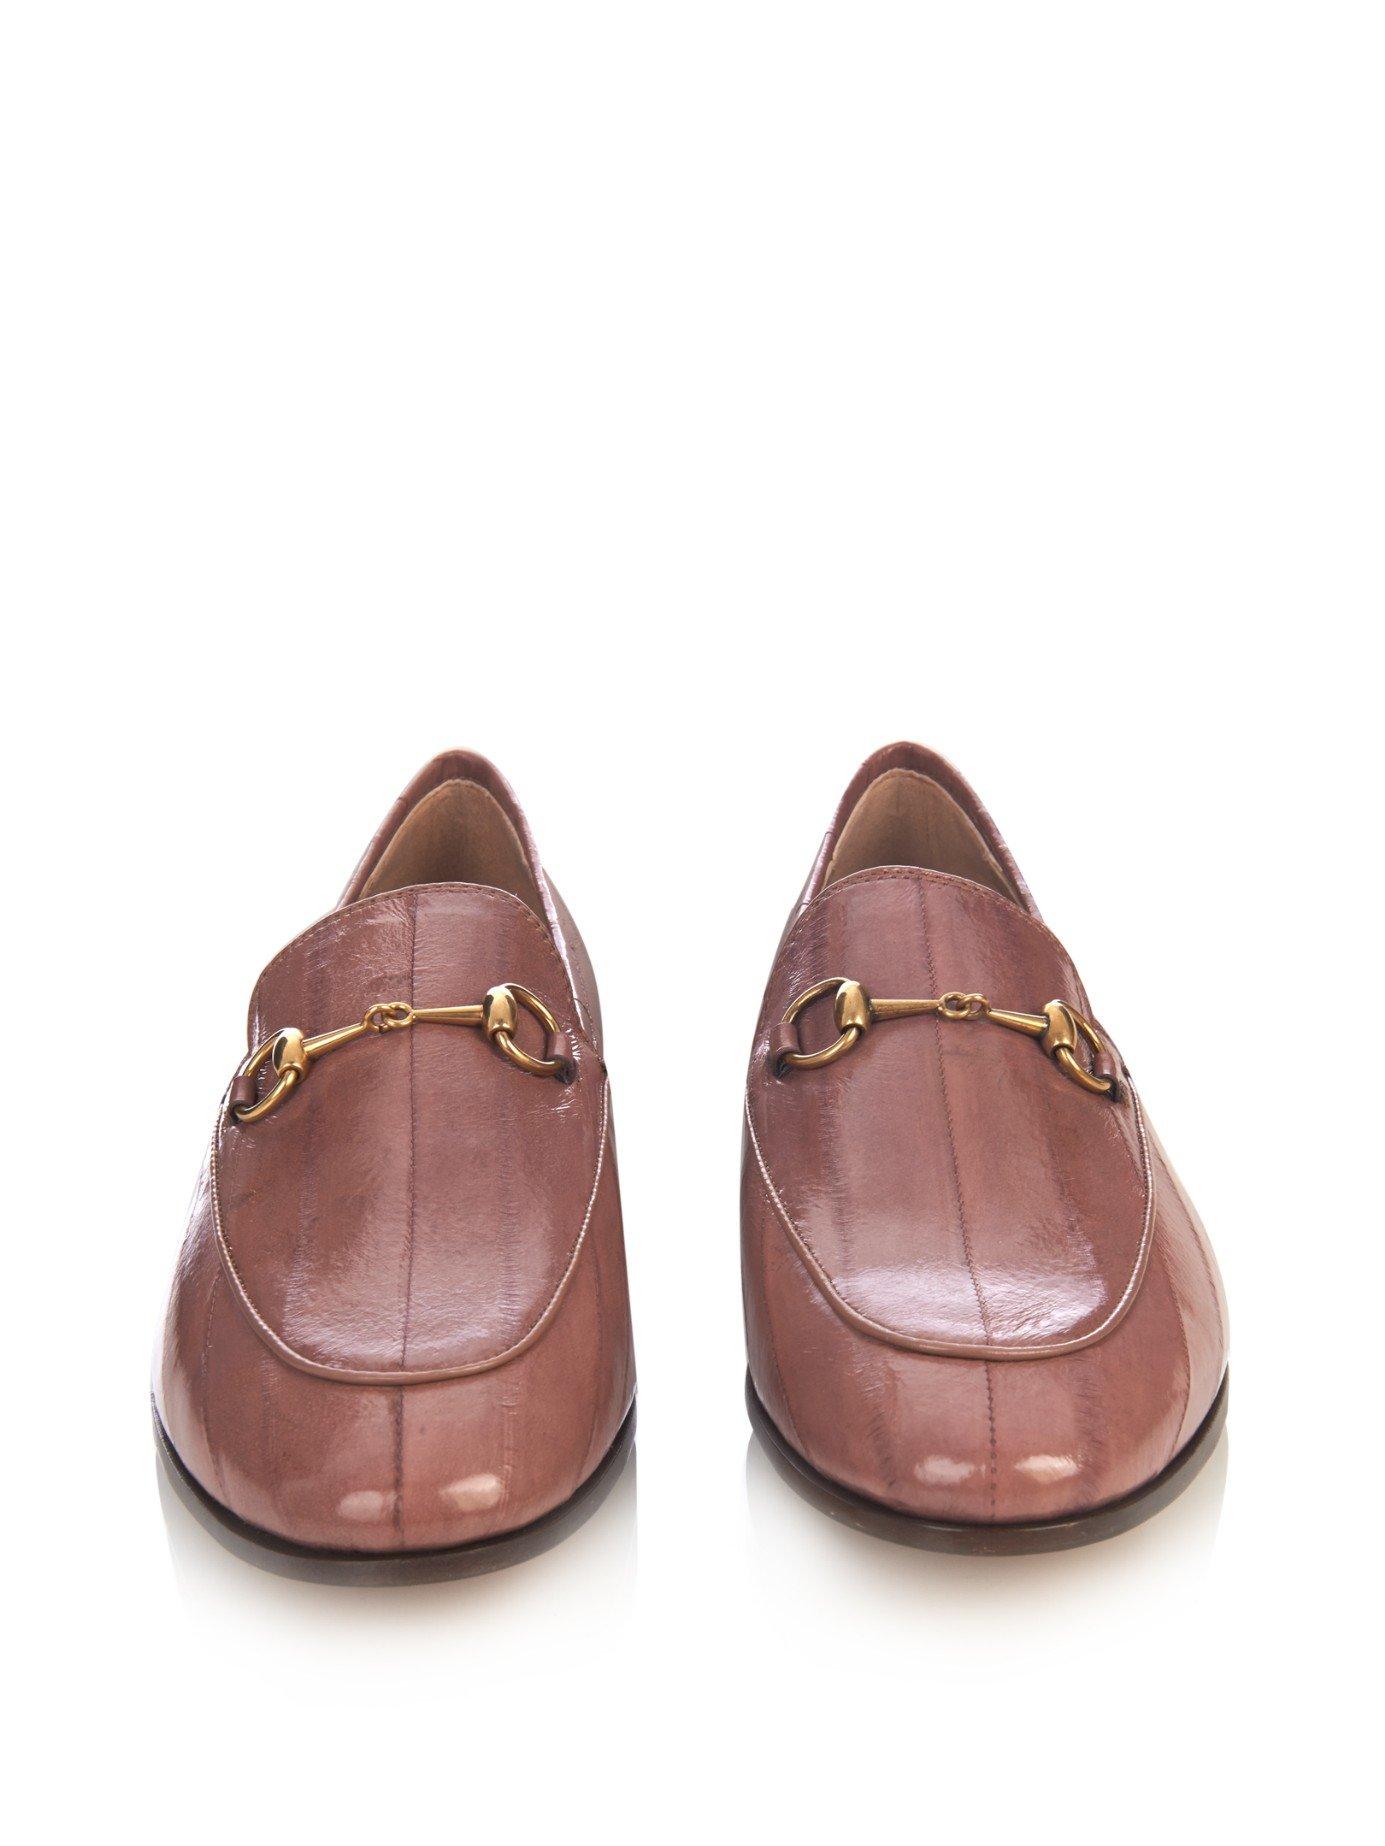 8218fdeb5de Lyst - Gucci Jordan Horse-Bit Leather Loafers in Pink